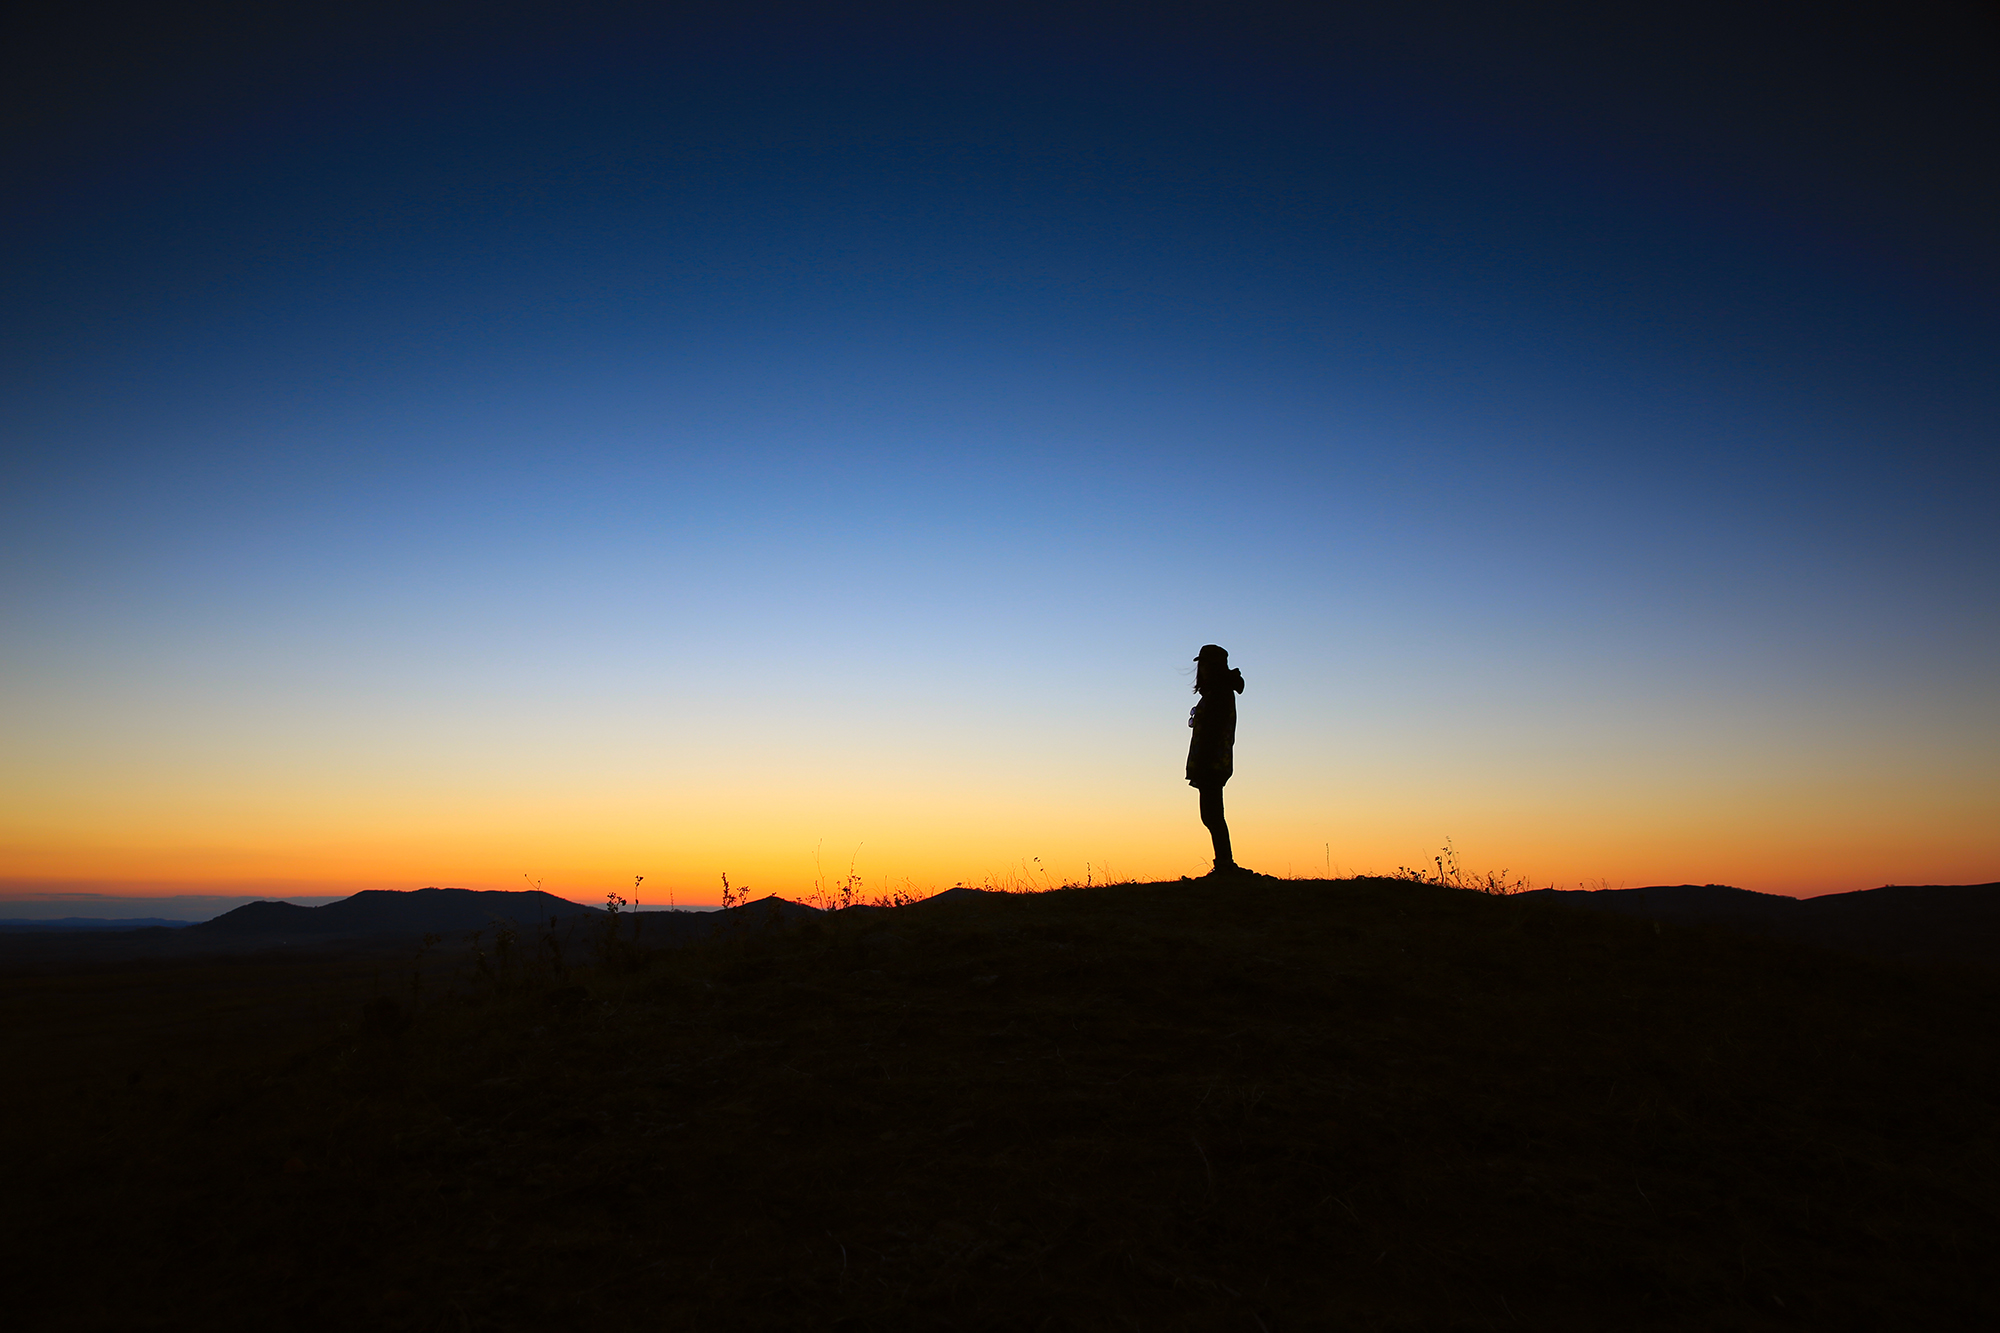 Unsplash Lone Hiker at Sunset